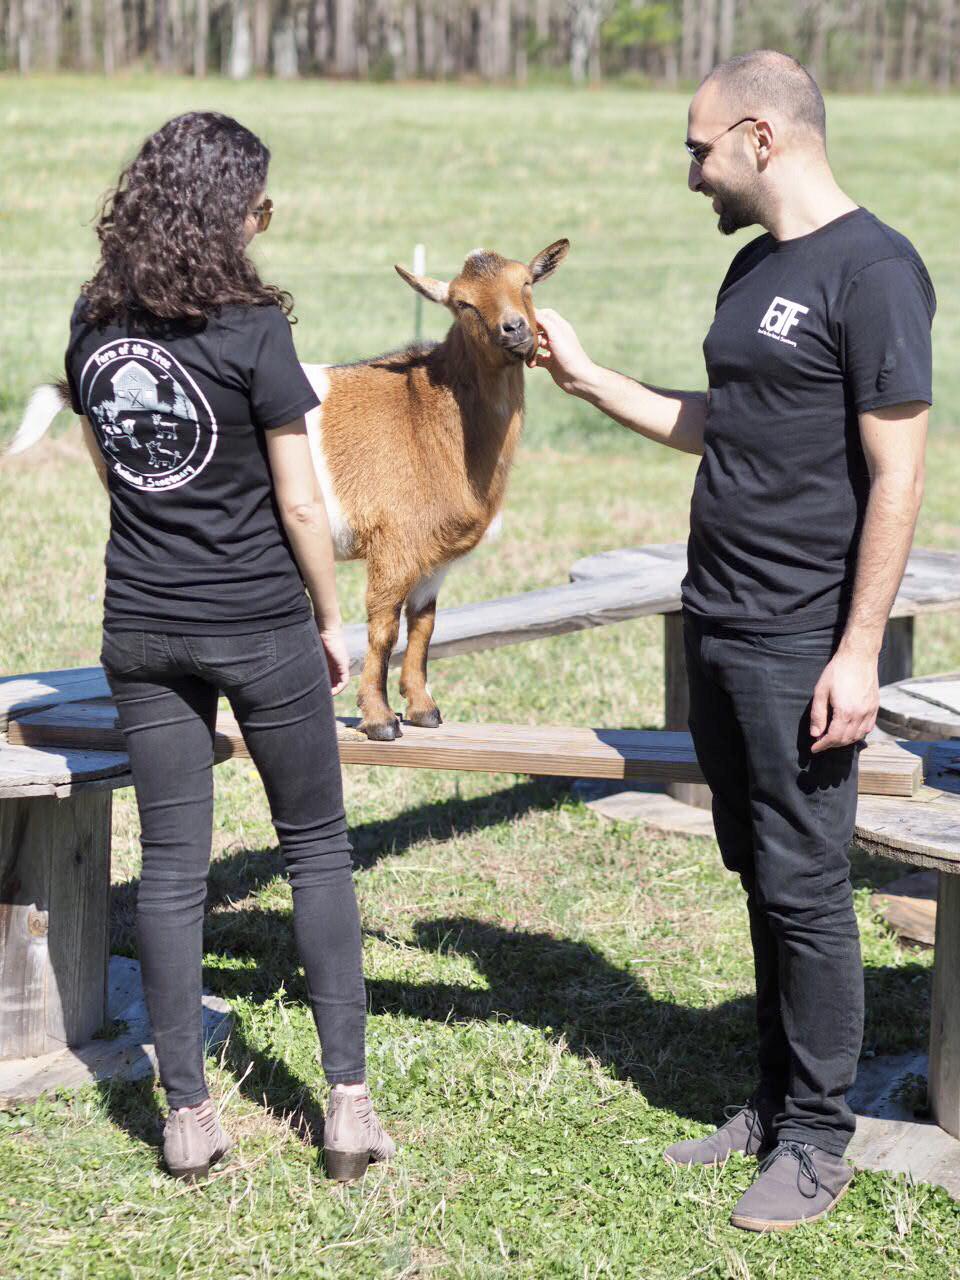 Black FOTF T-Shirt